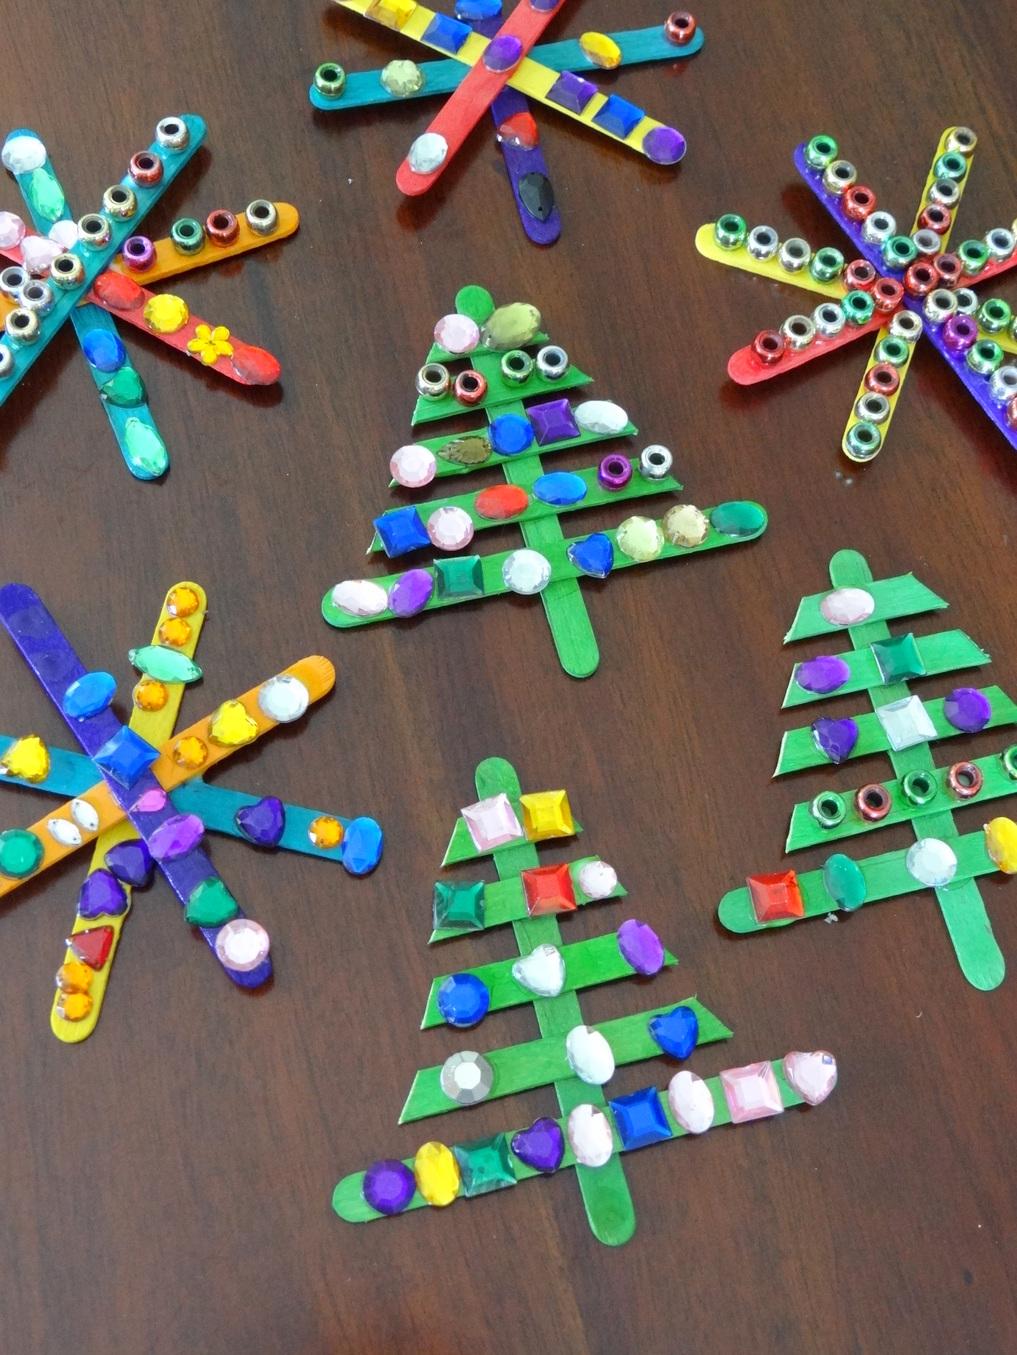 Homemade Christmas Tree Decorations - Paddle Pop Stick Christmas Tree